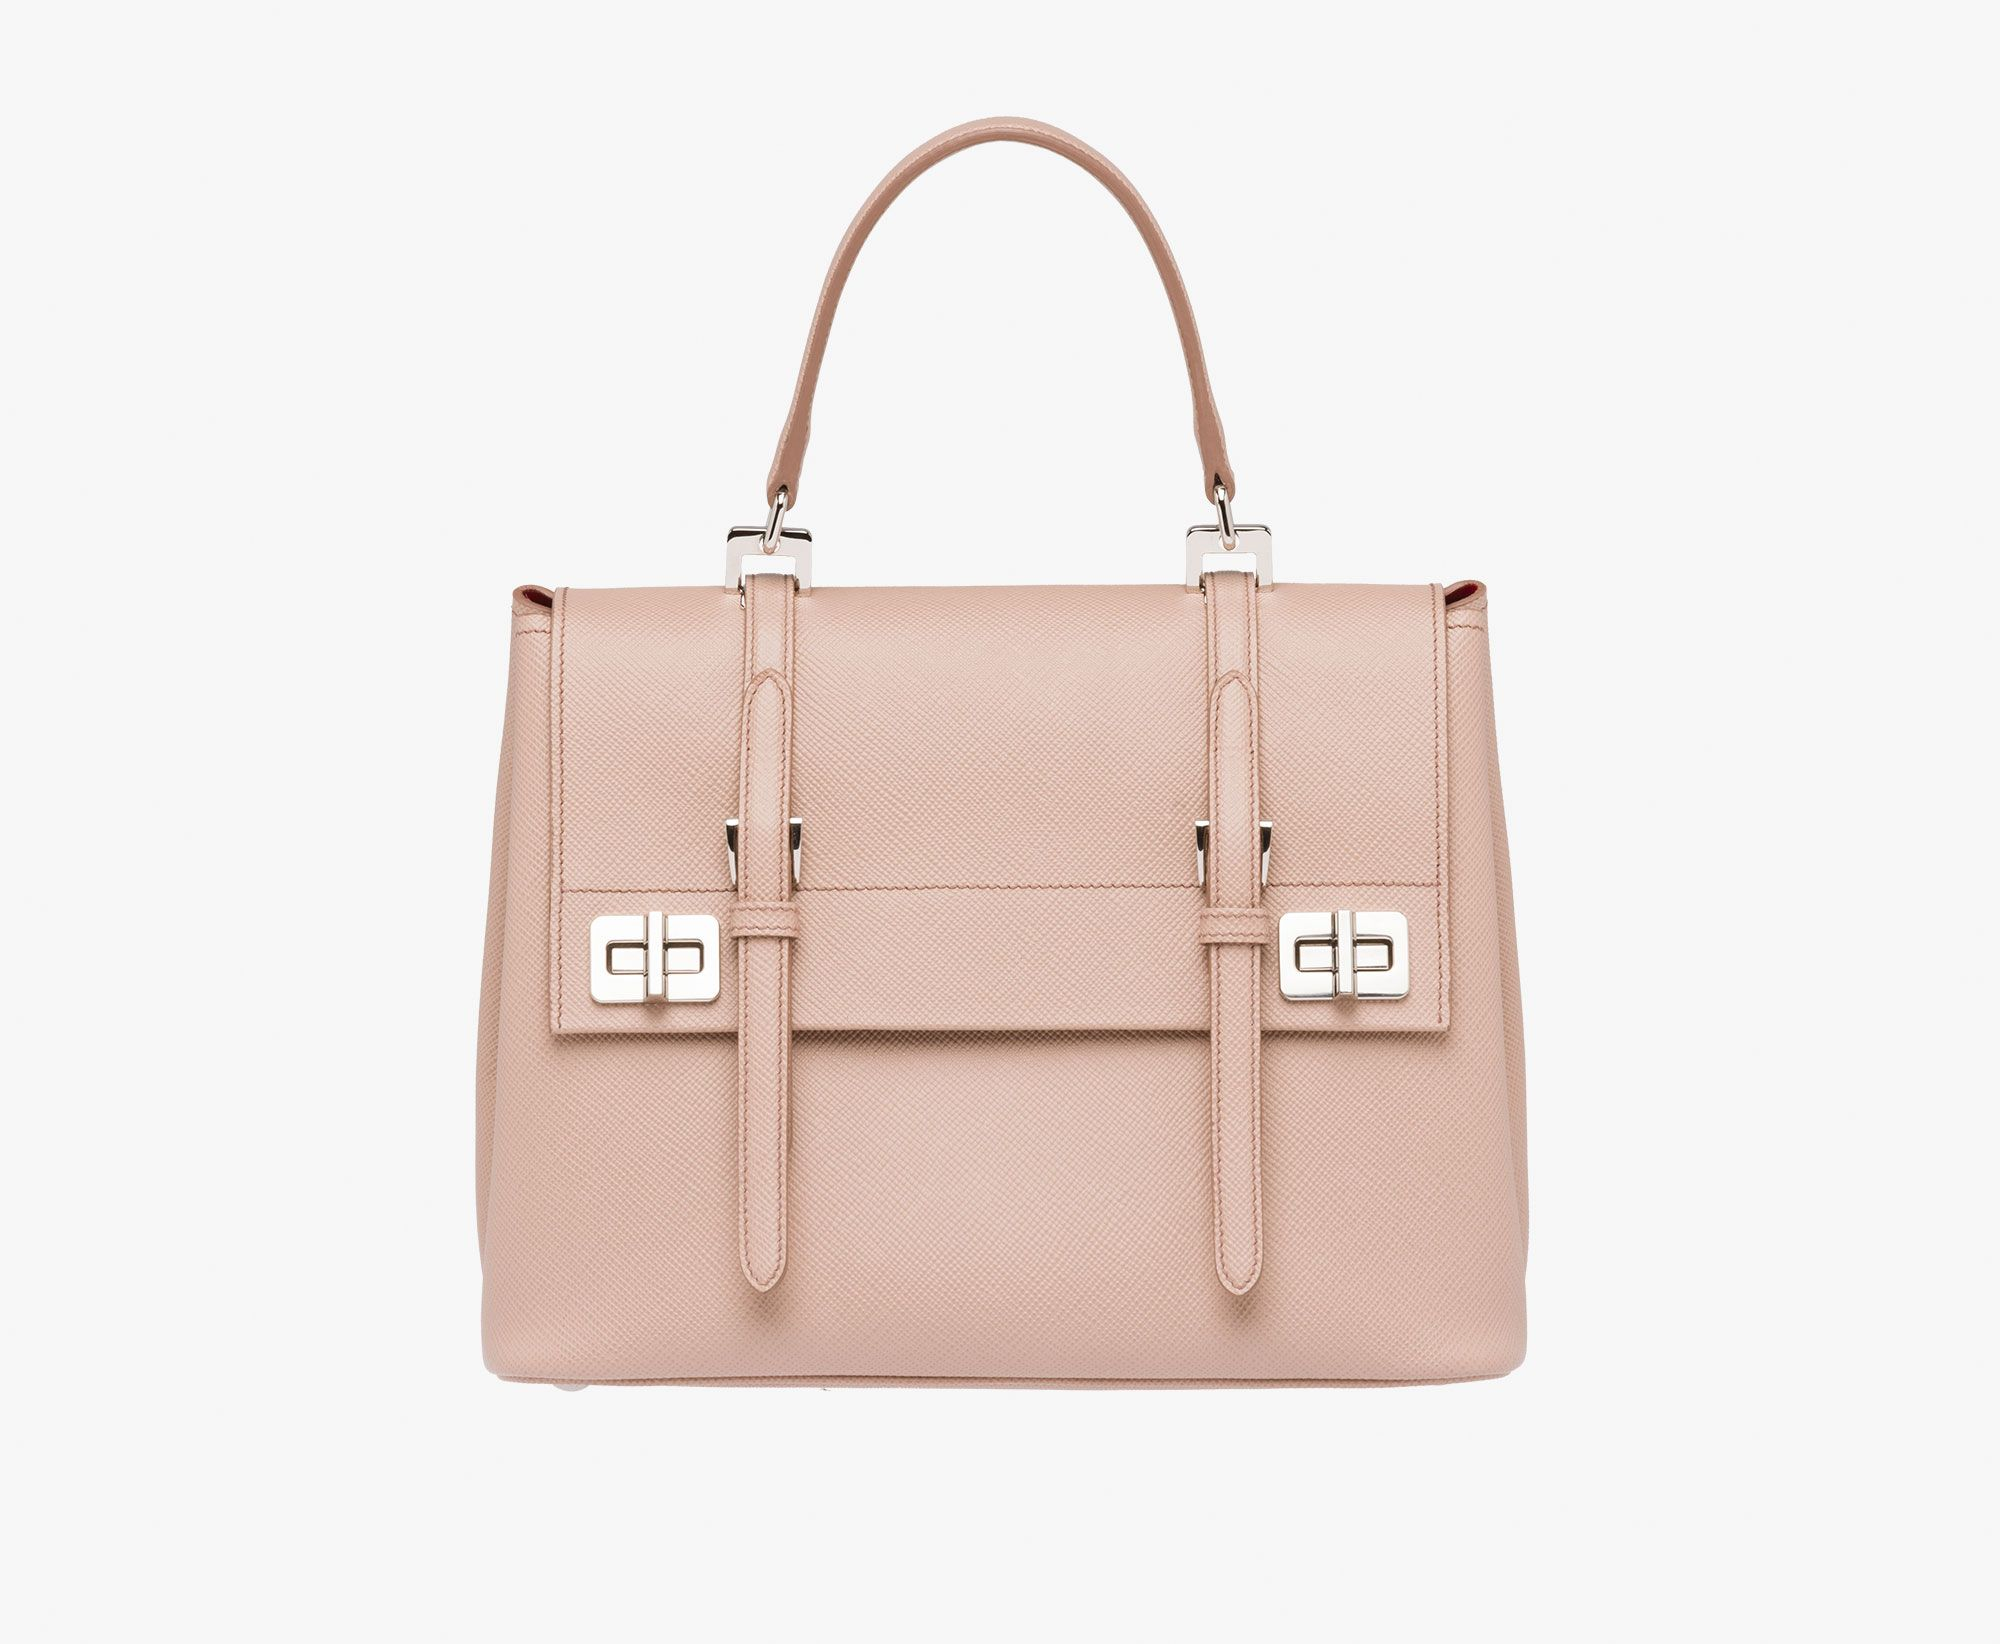 release date prada top handle briefcase number f01ae 8c8f7 25abef9965f5e